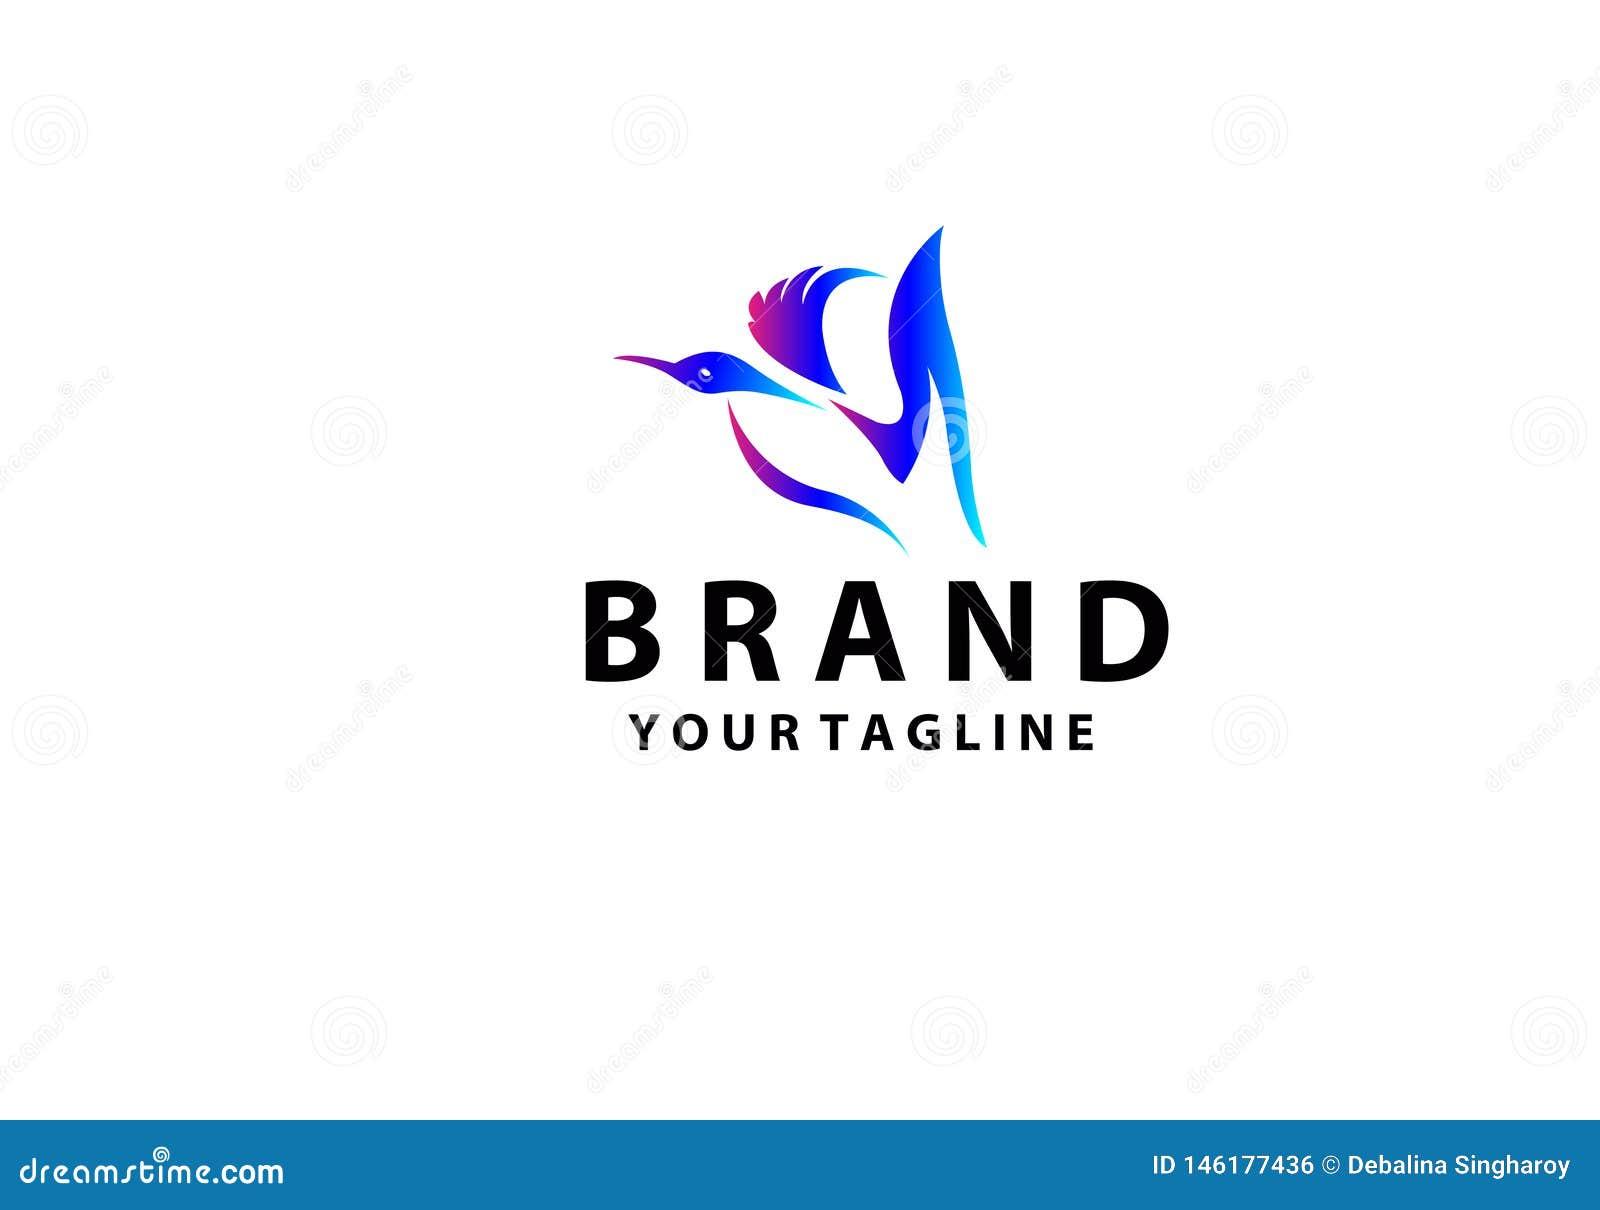 Logotipo elegante colorido simple del pato, logotipo abstracto del pato Ejemplo creativo del dise?o